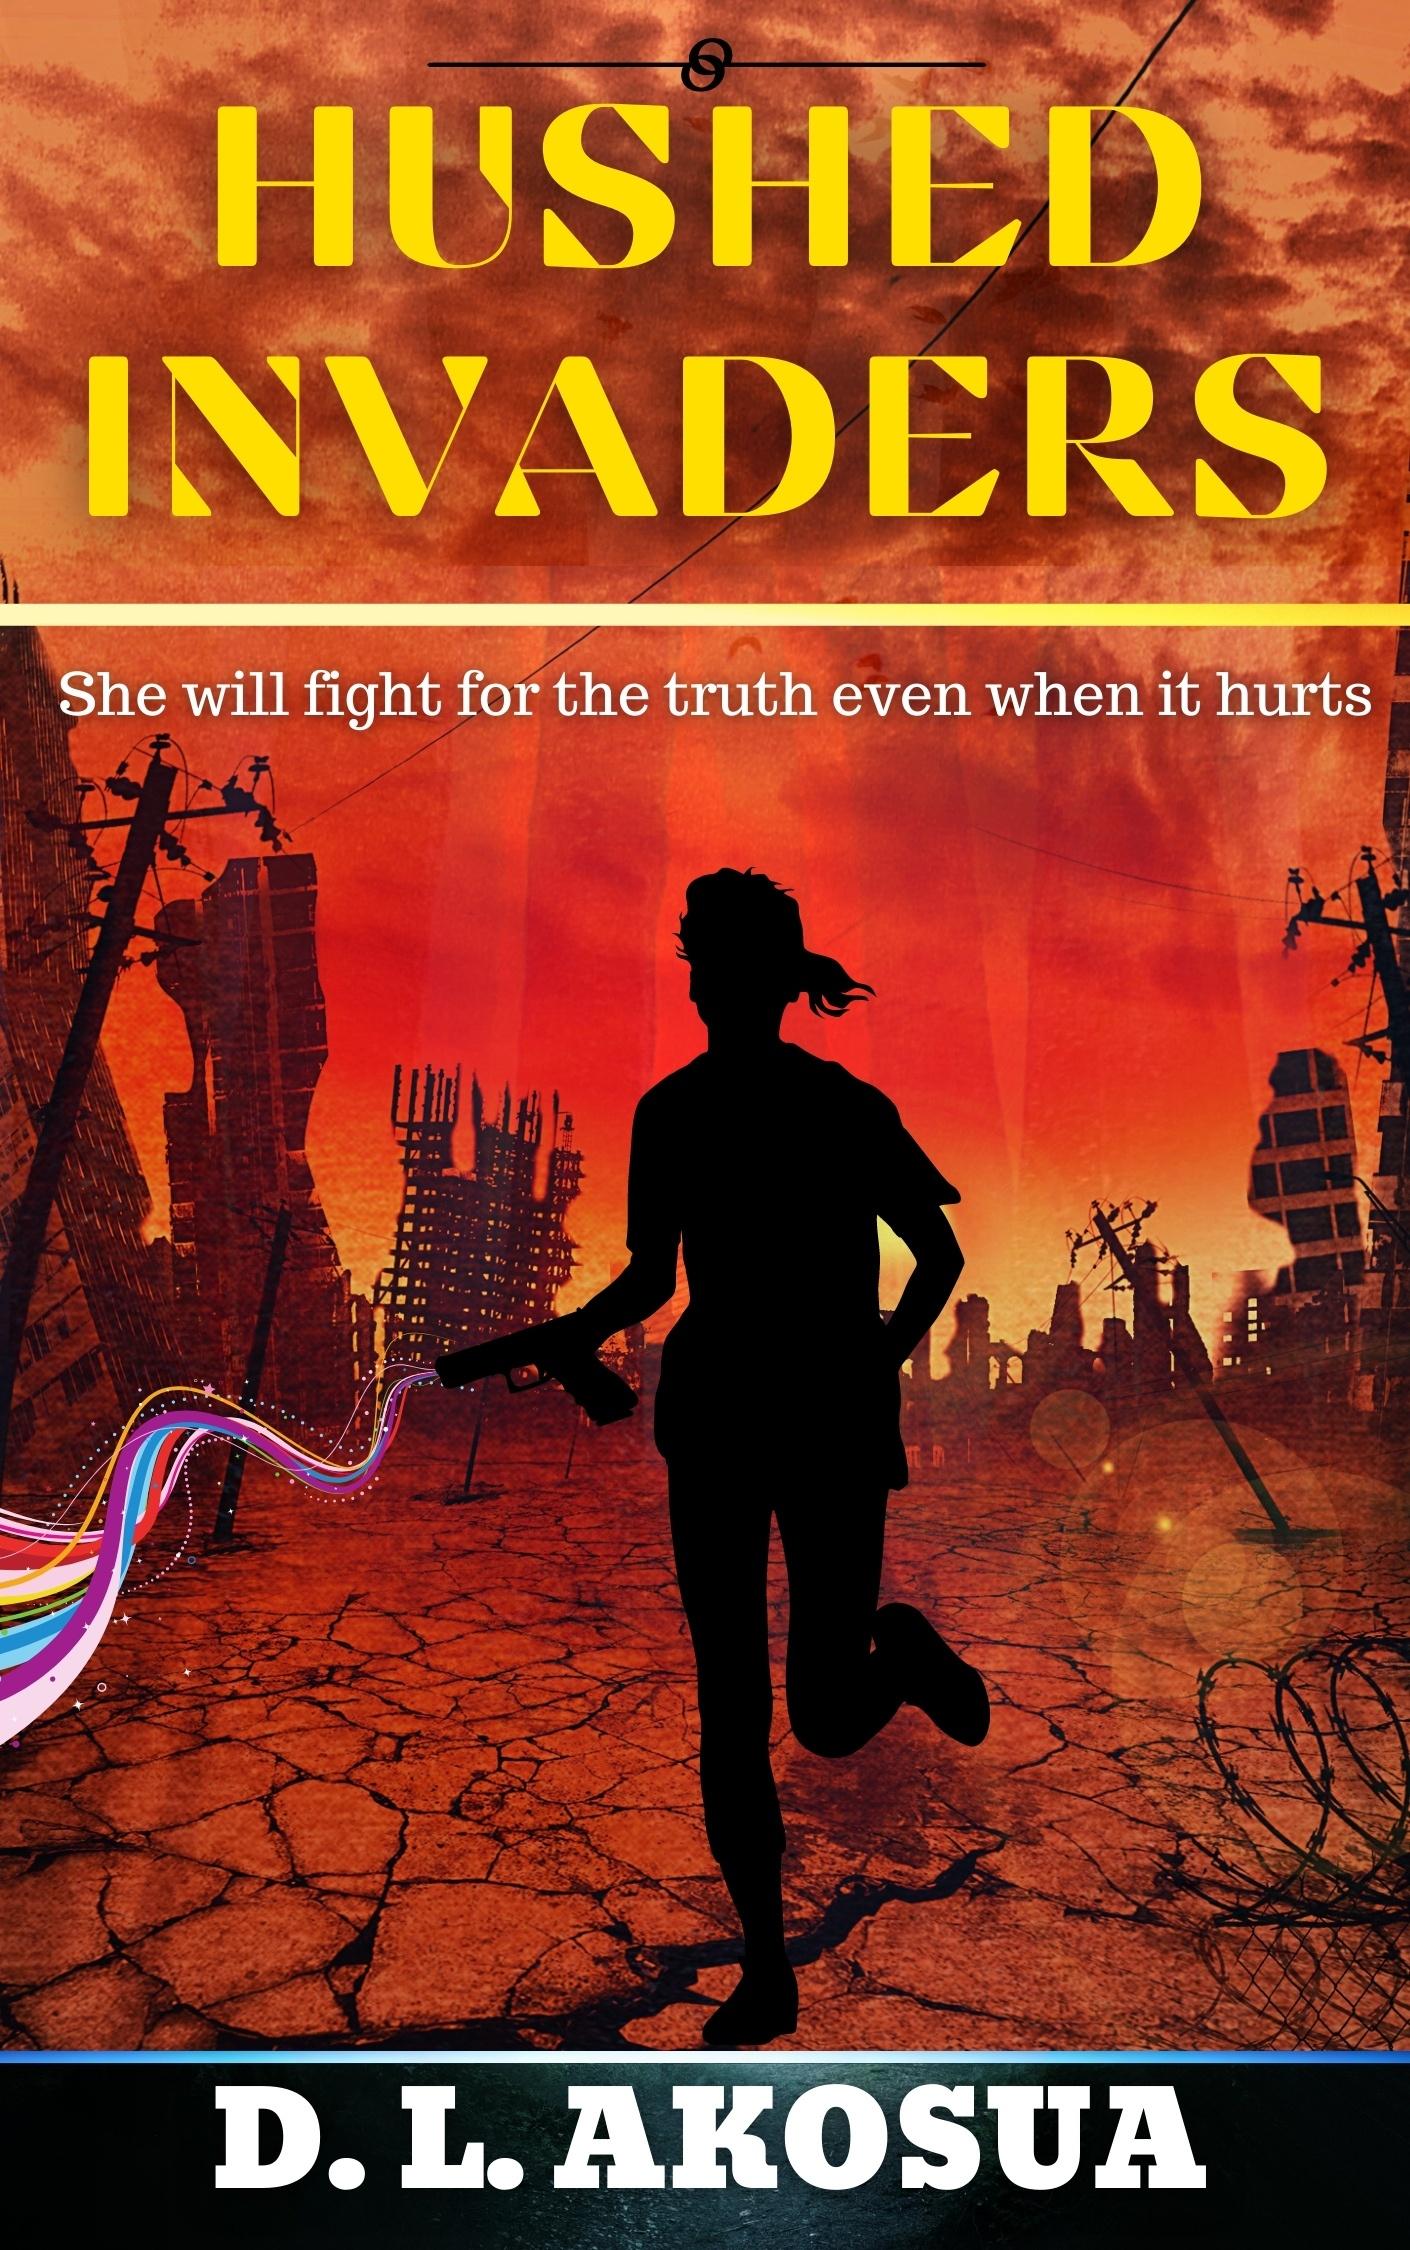 Hushed-invaders-e-book-cover-FINAL-v3-1.jpg